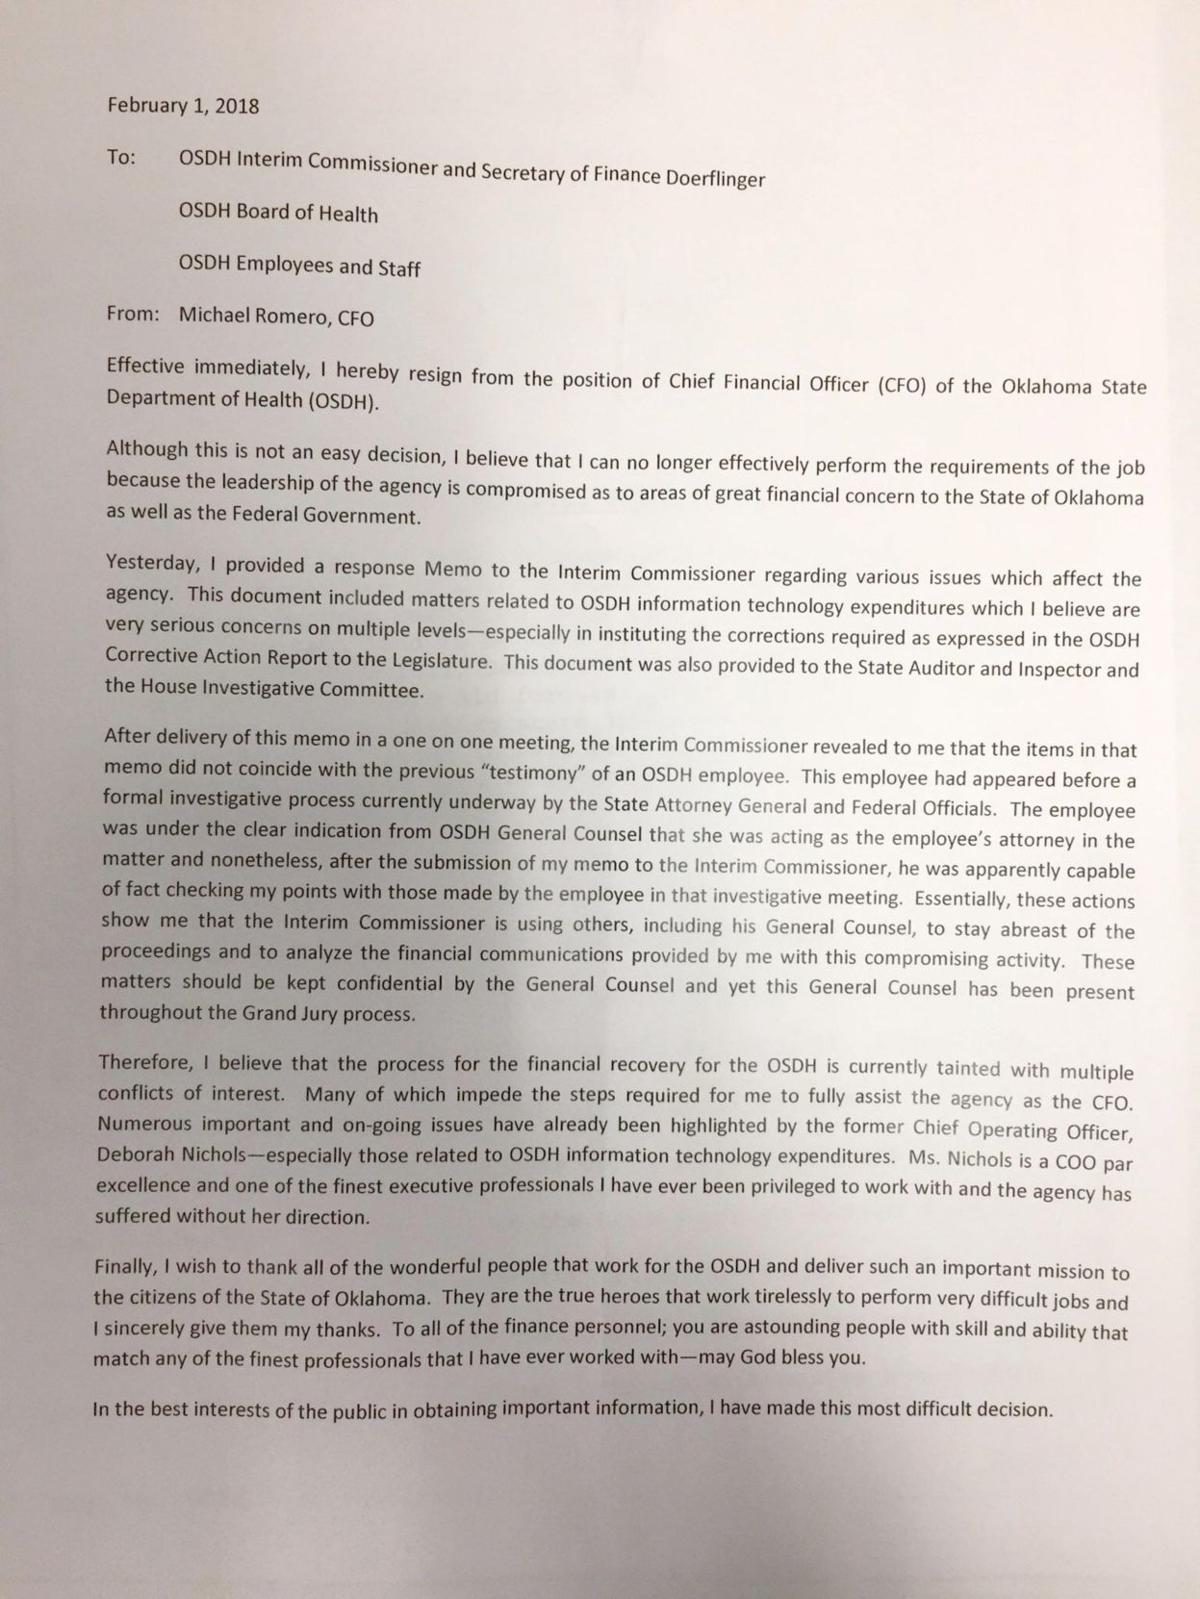 Document health department cfo resignation letter tulsaworld download pdf document health department cfo resignation letter expocarfo